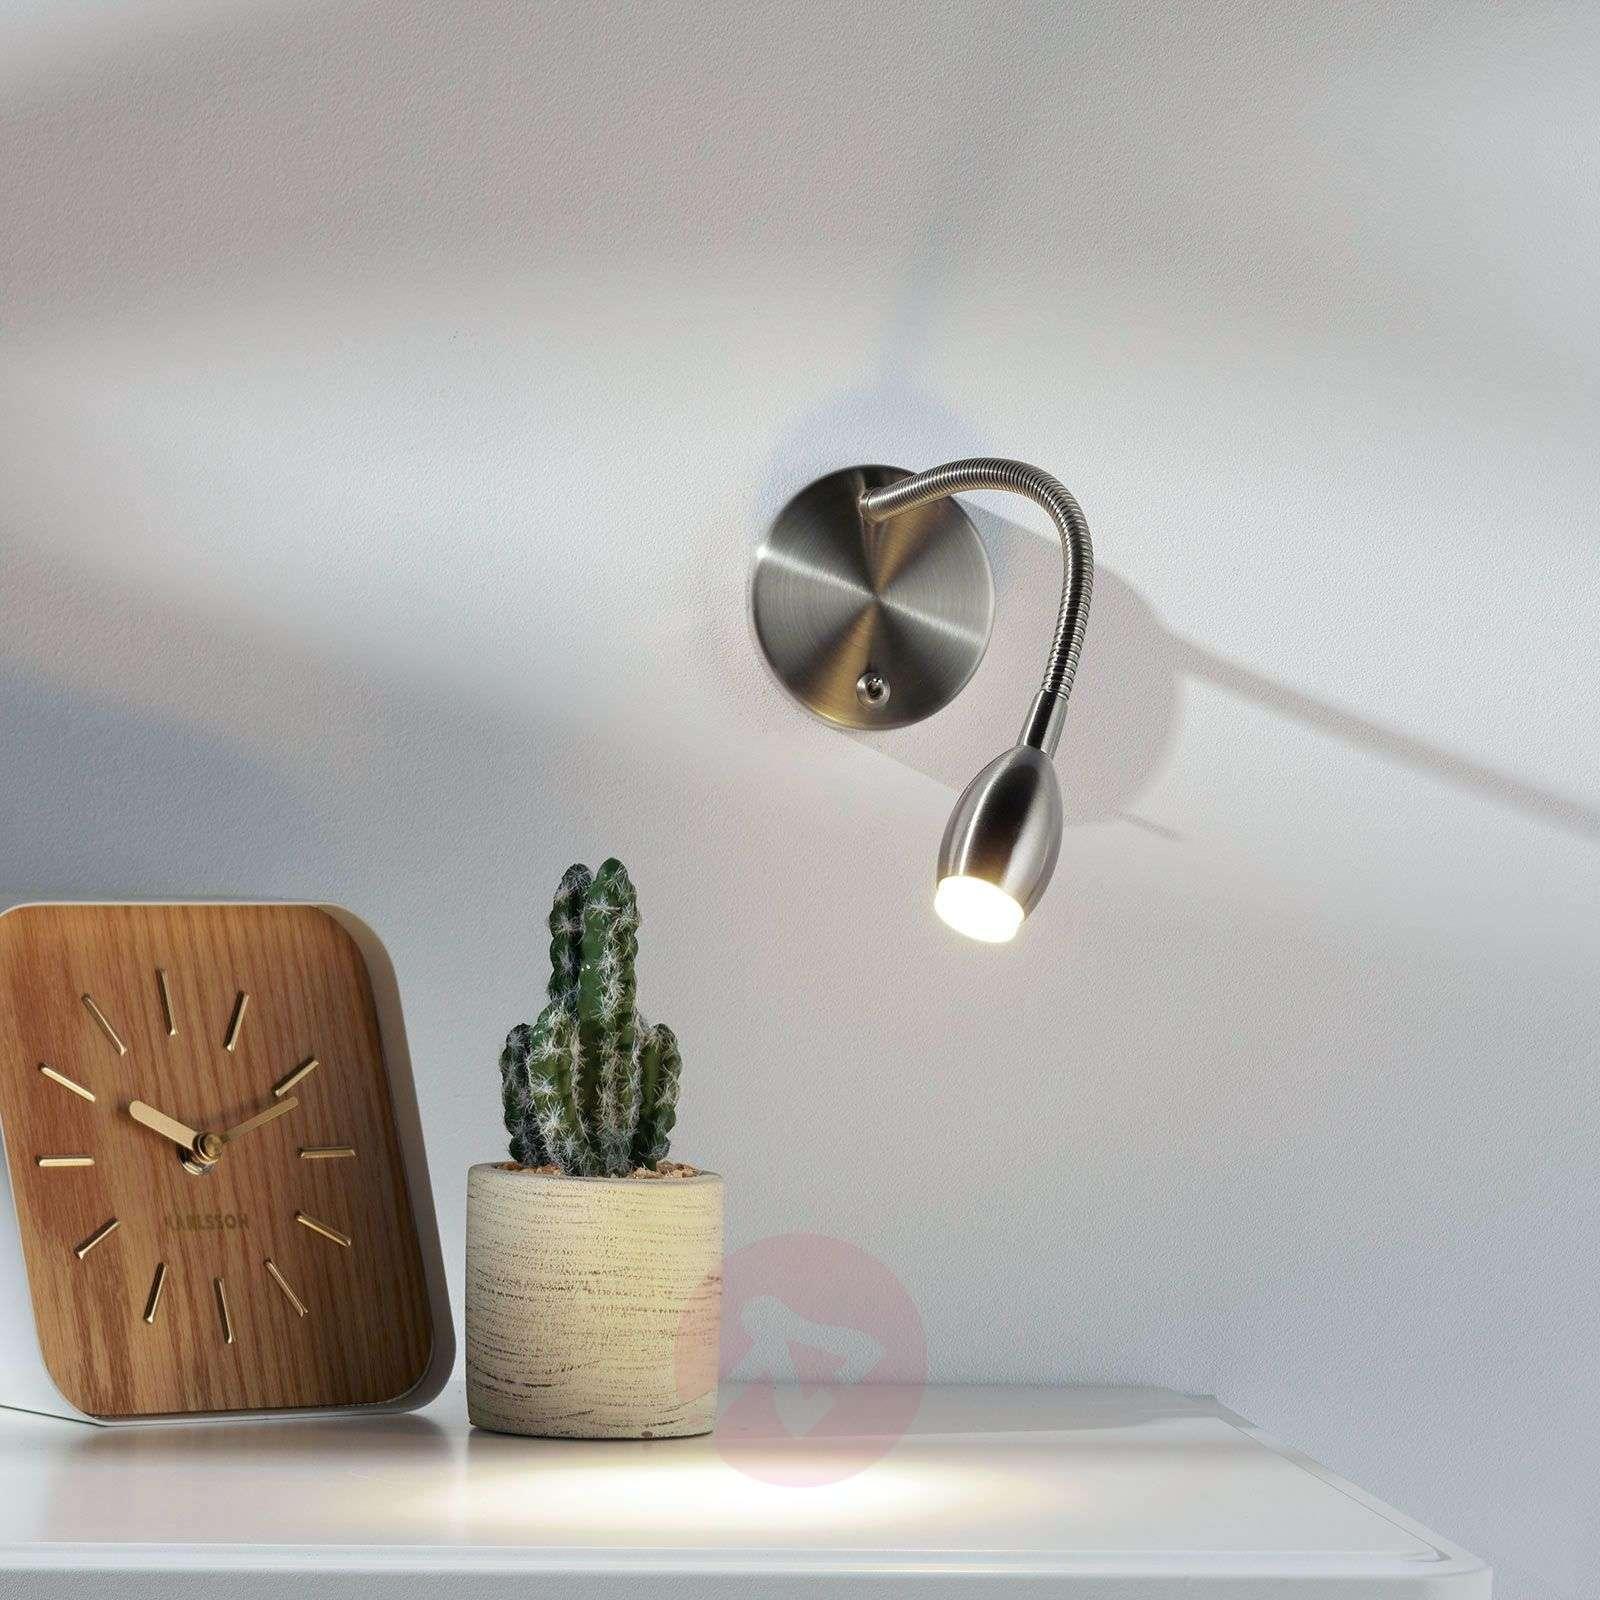 Flexi-arm wall light MARTA with LED, nickel-1050009-01